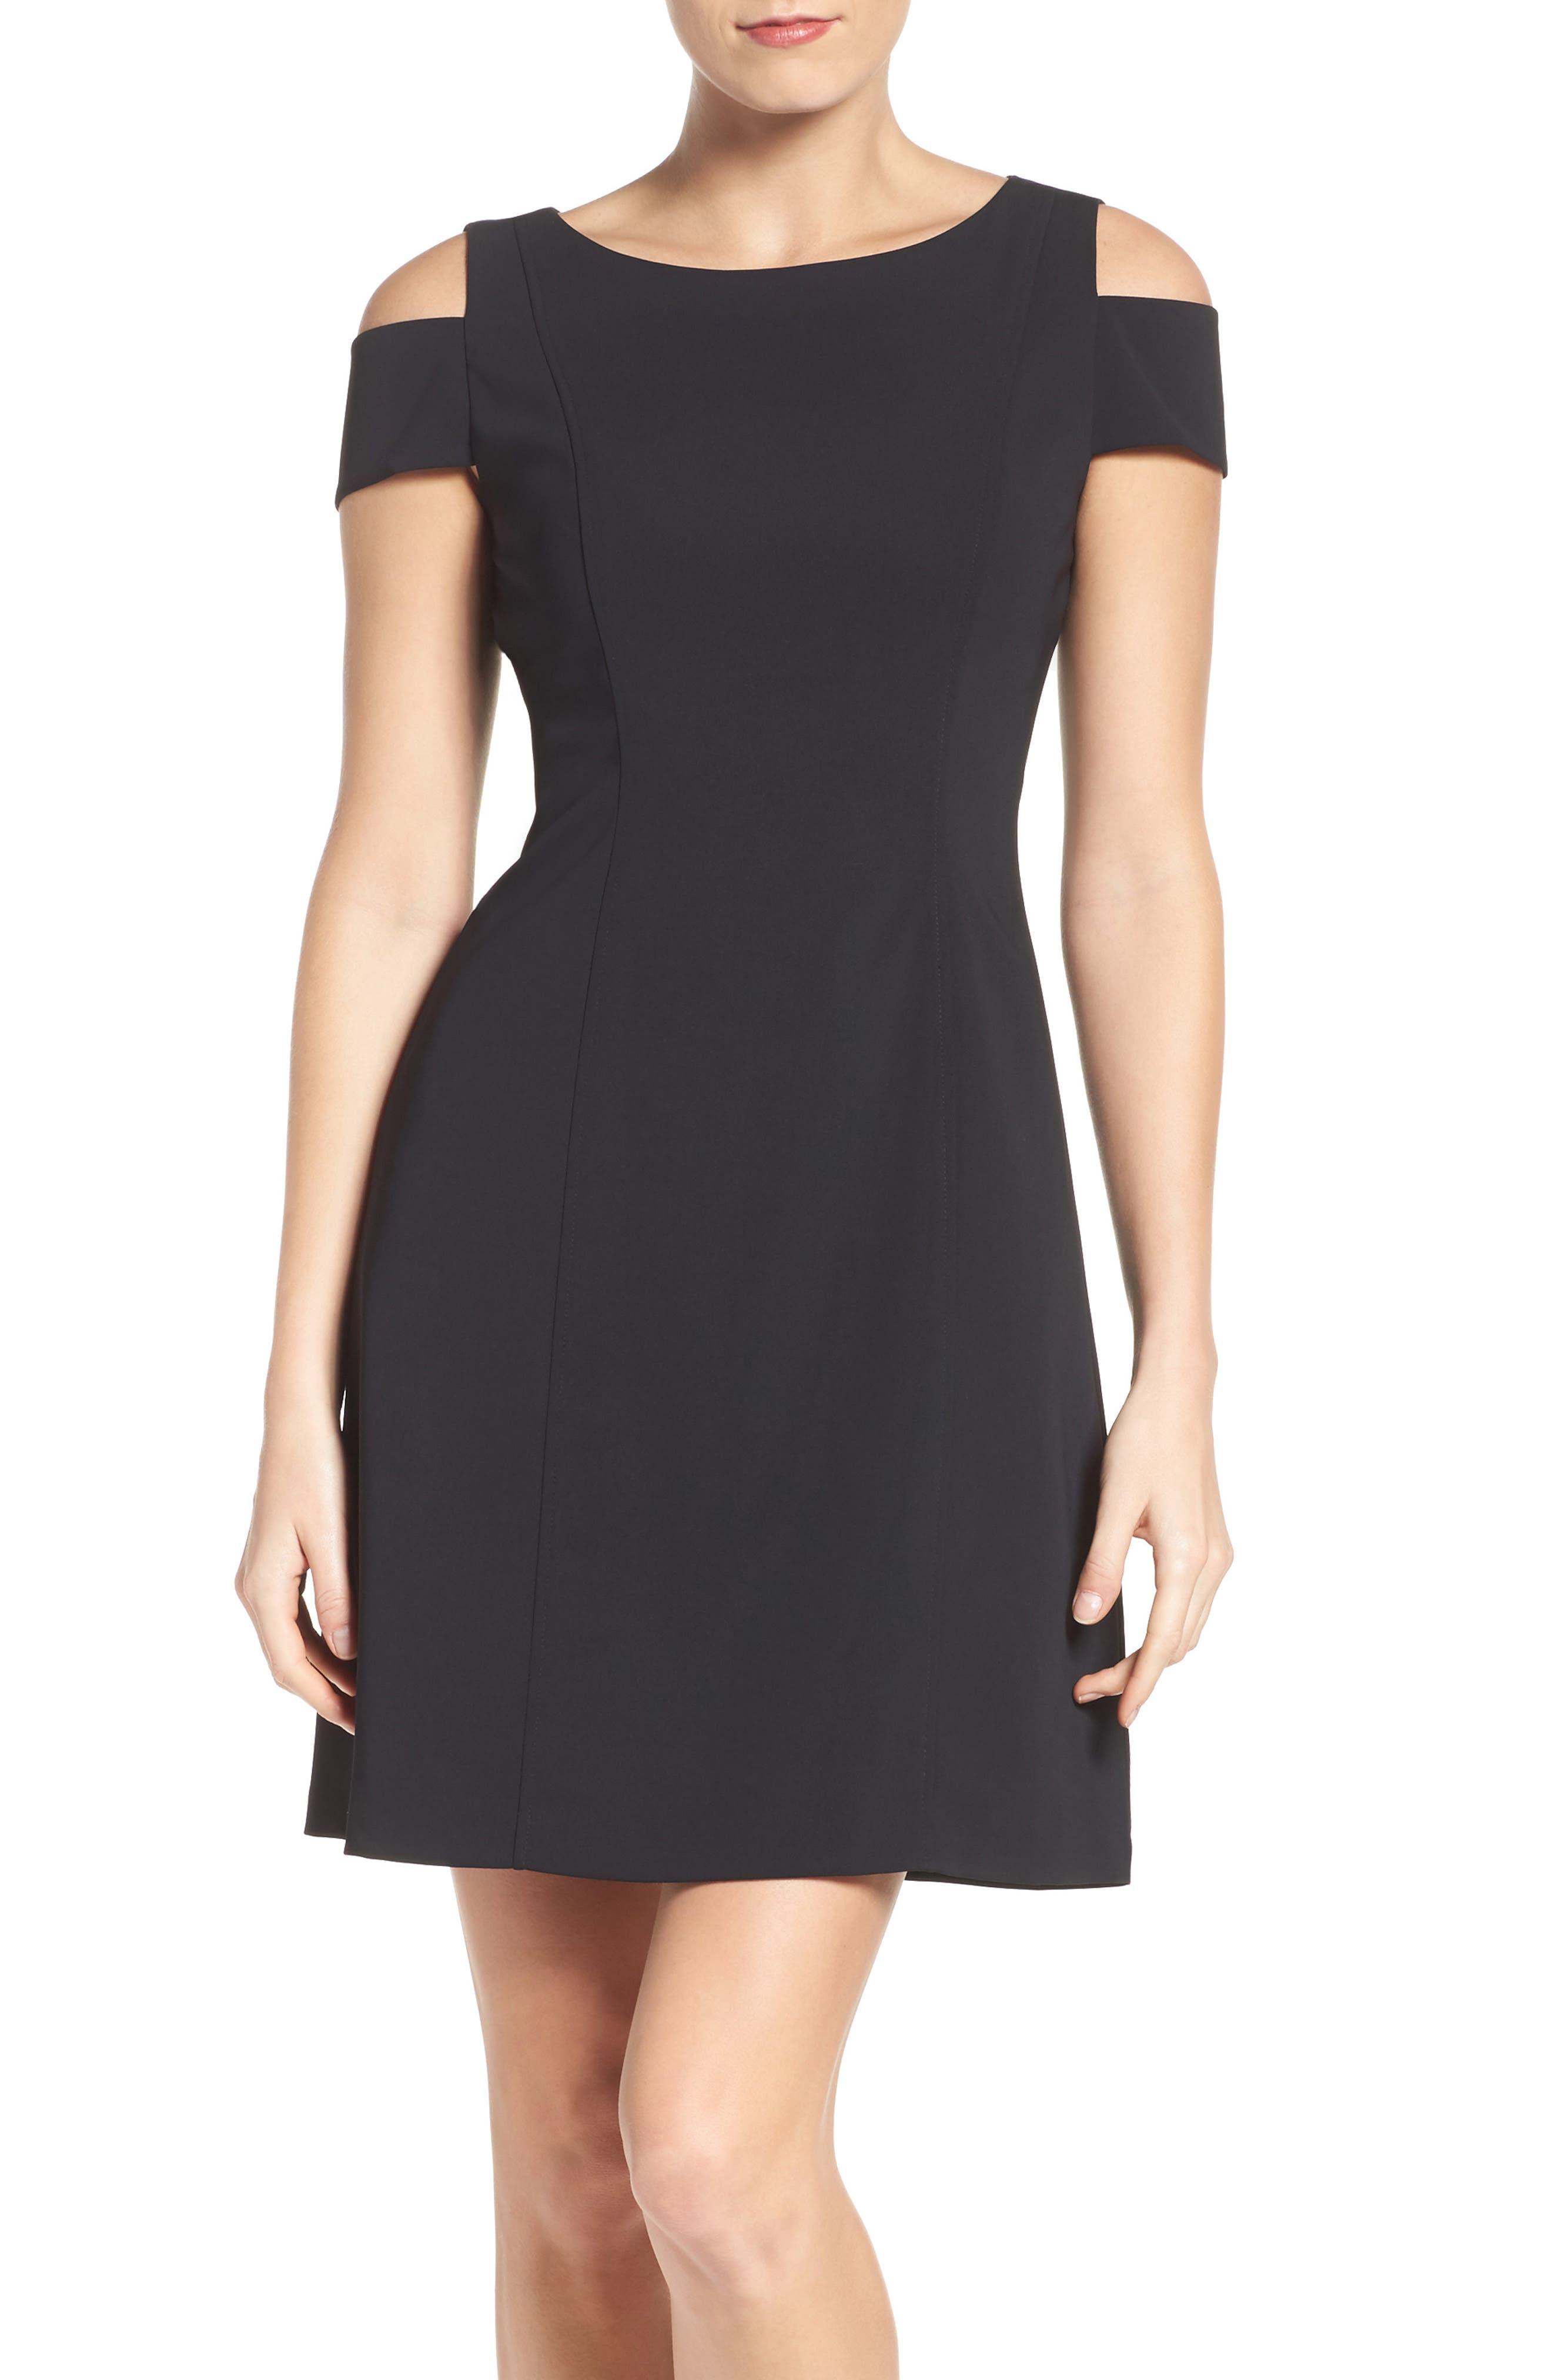 Main Image - Adrianna Papell Cold Shoulder Stretch A-Line Dress